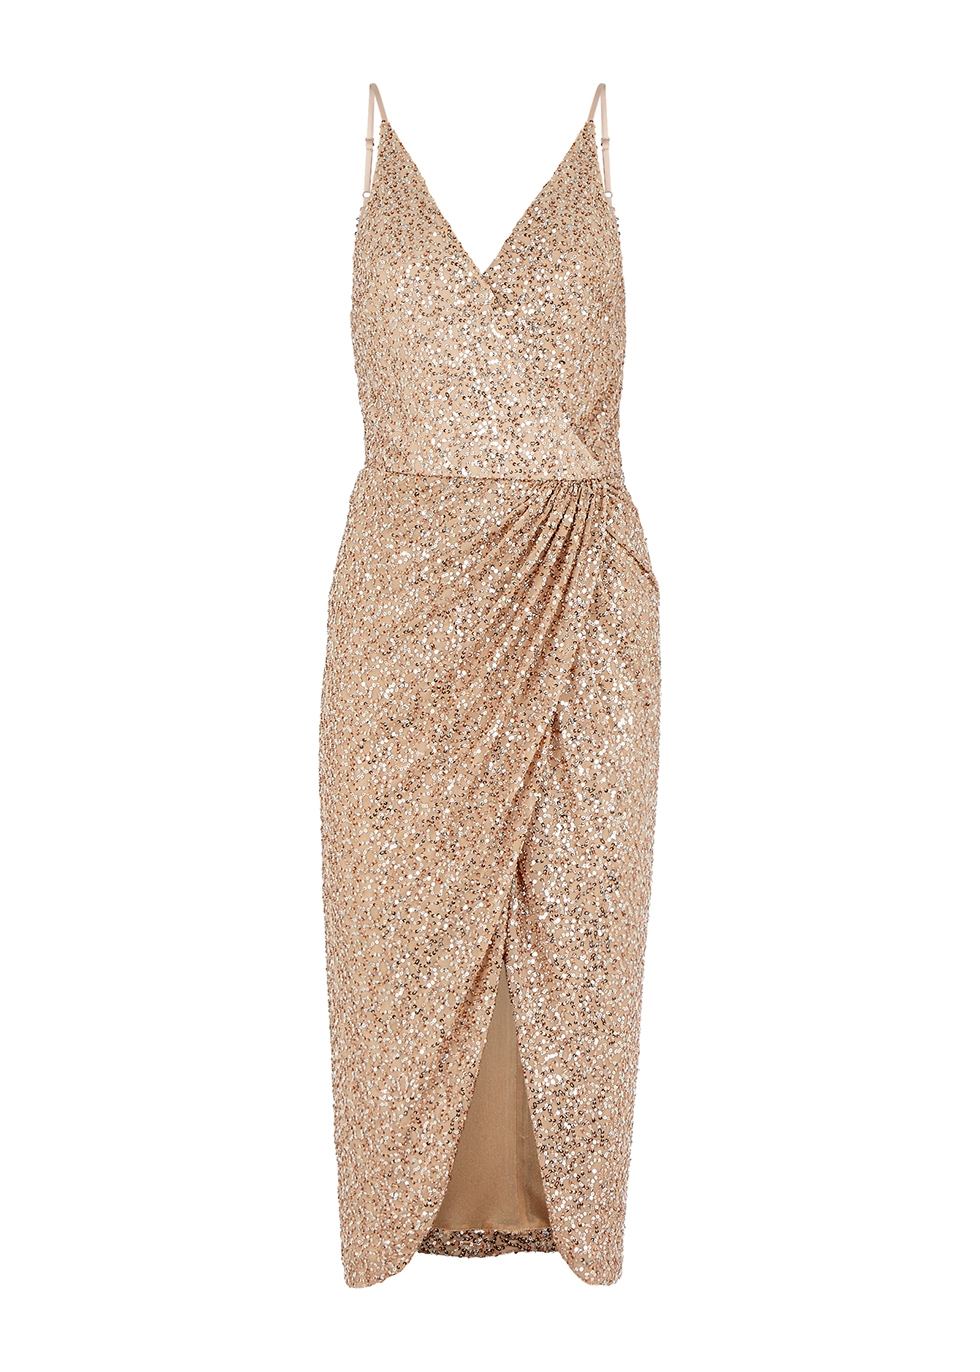 023544e27a Designer Dresses & Designer Gowns - Harvey Nichols